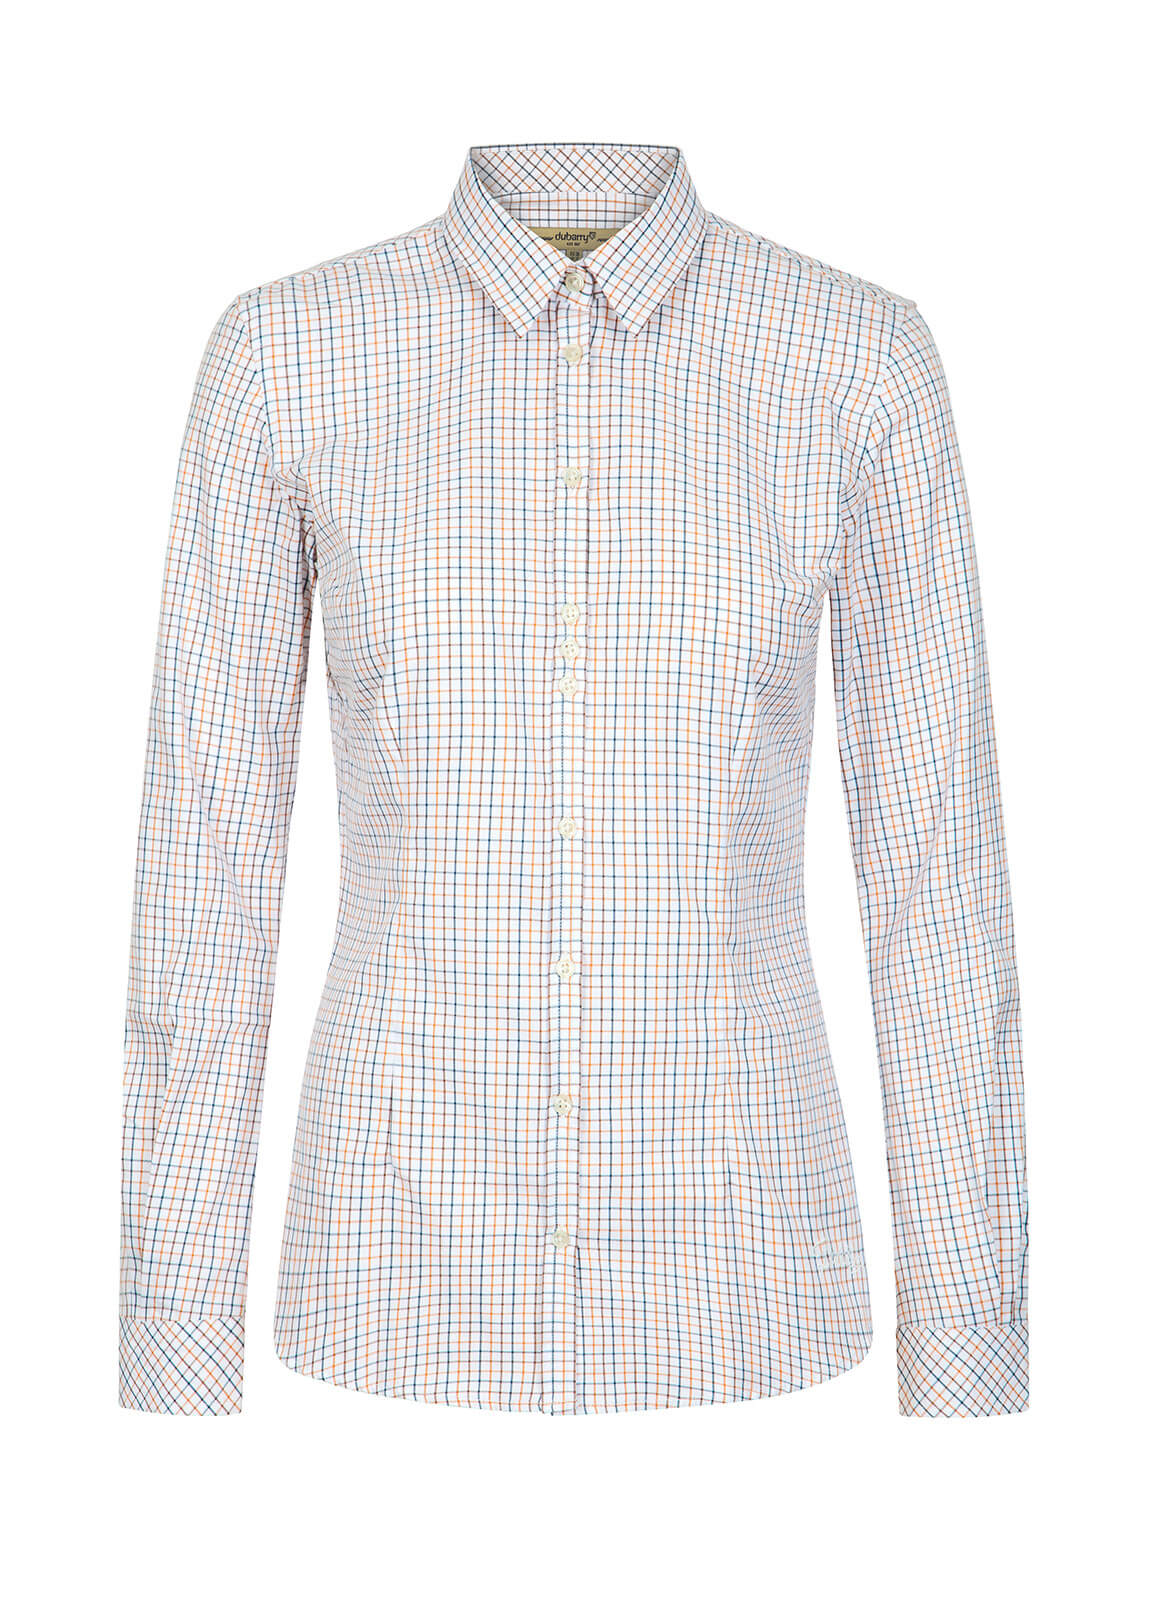 Dubarry_Elderflower Women's Shirt - Brown Multi_Image_2